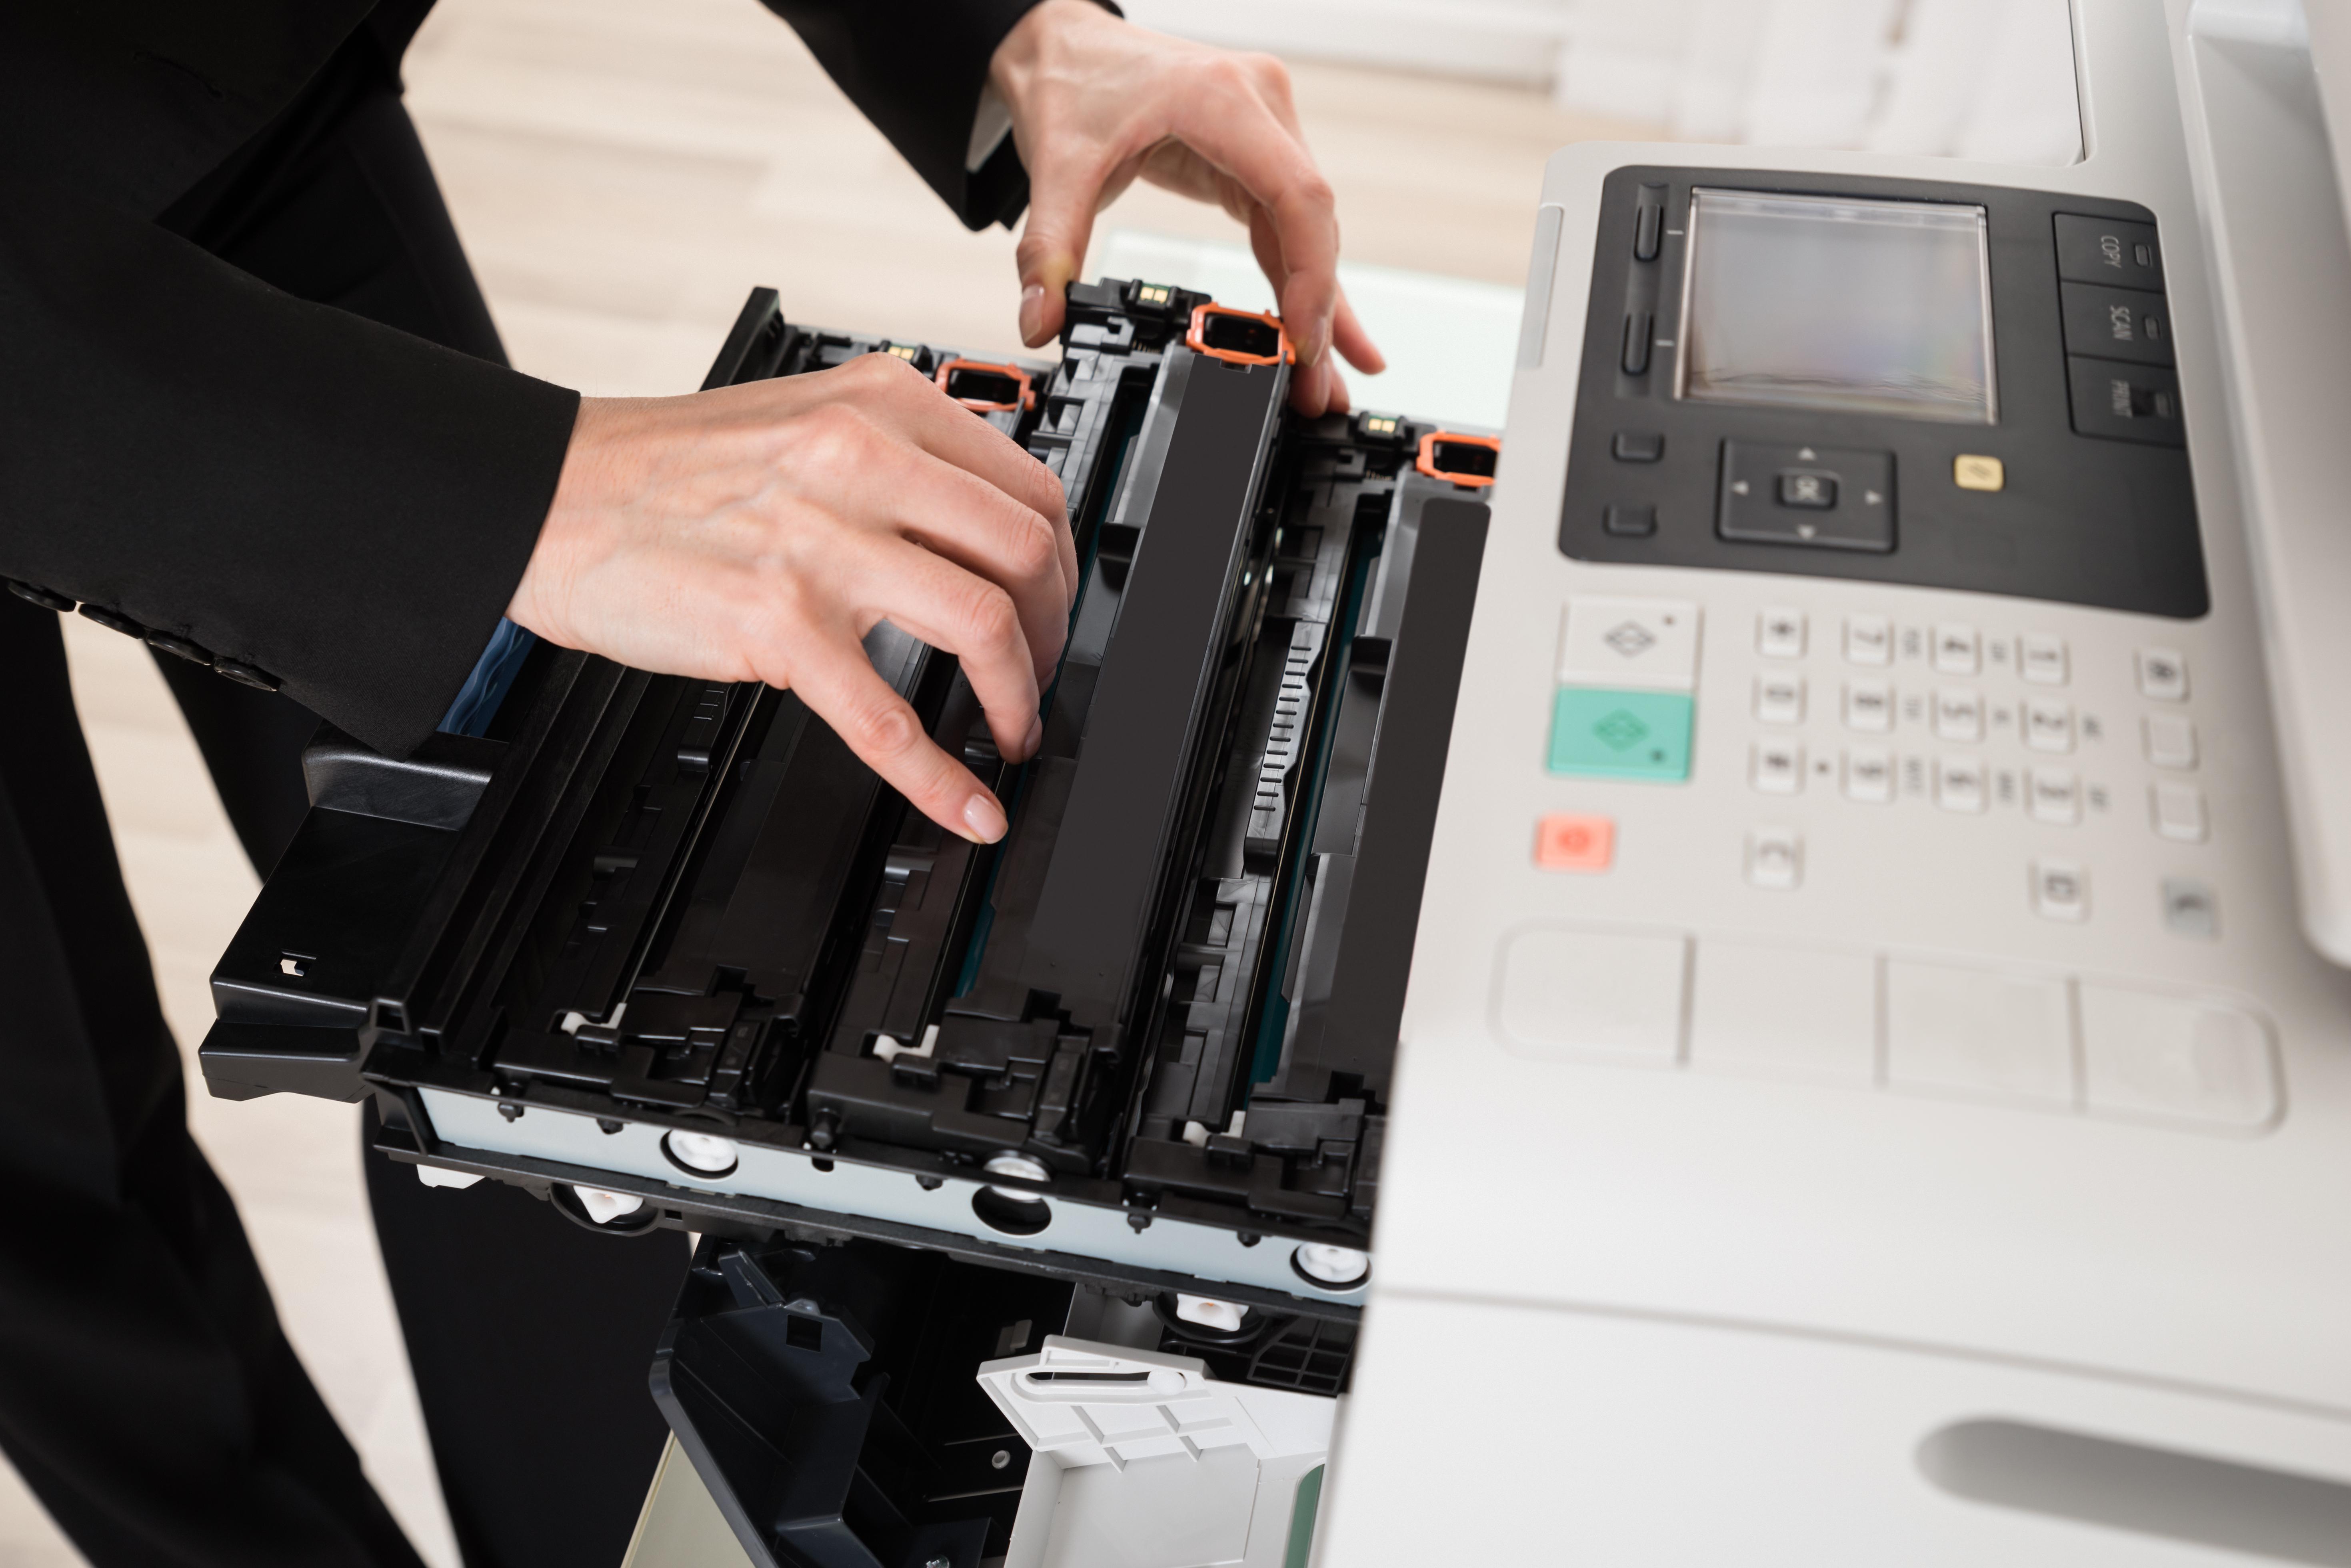 Servicio técnico: Servicios de Ofima Grupo Oficina S.L.